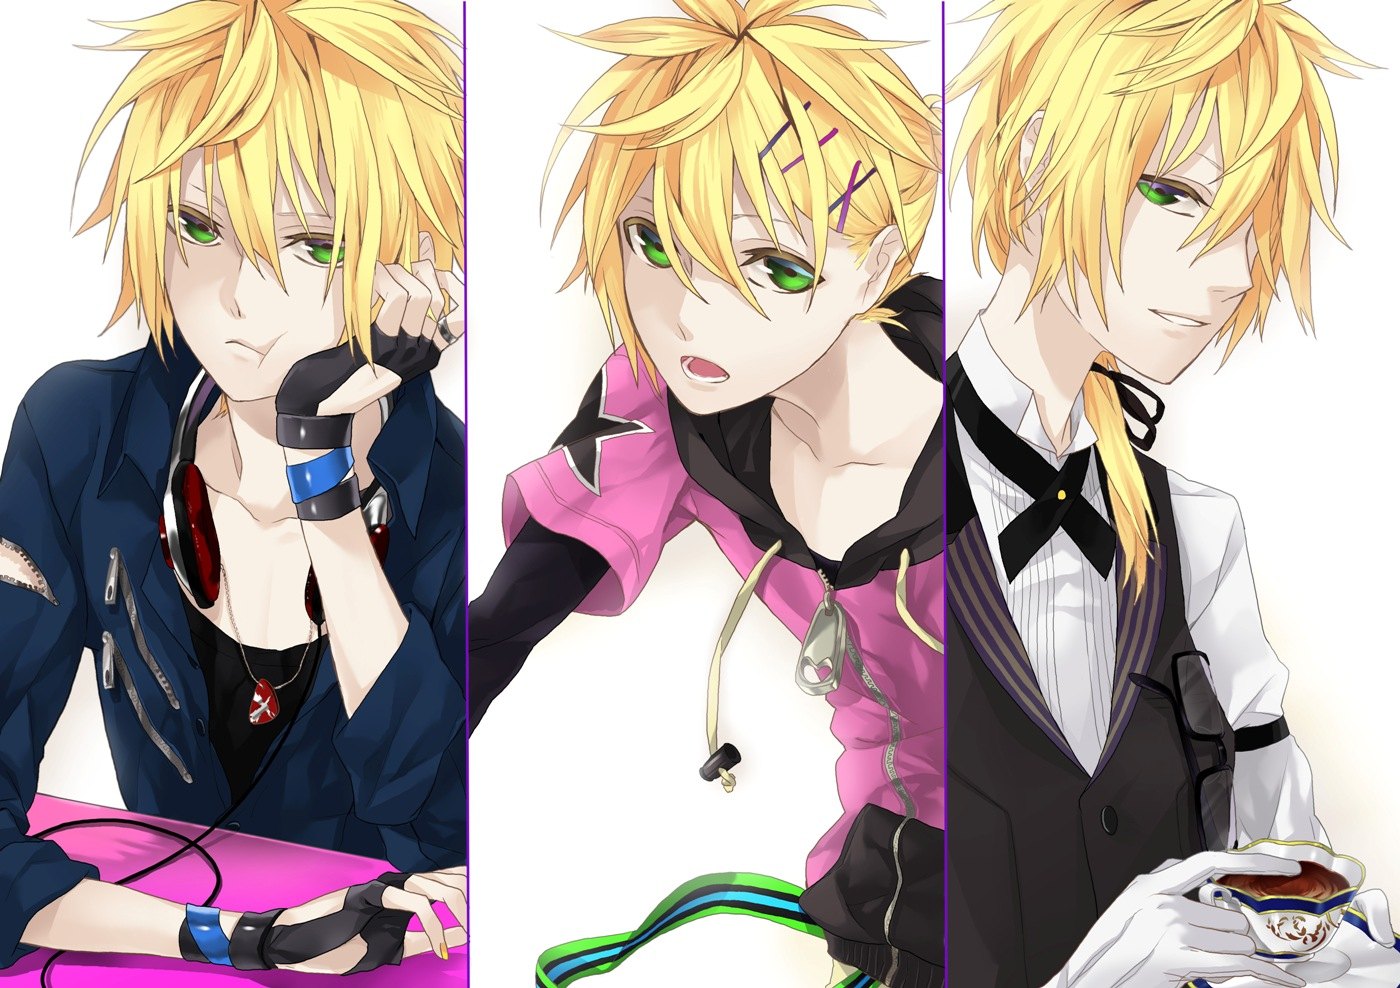 Teacup | page 3 of 201 - Zerochan Anime Image Board